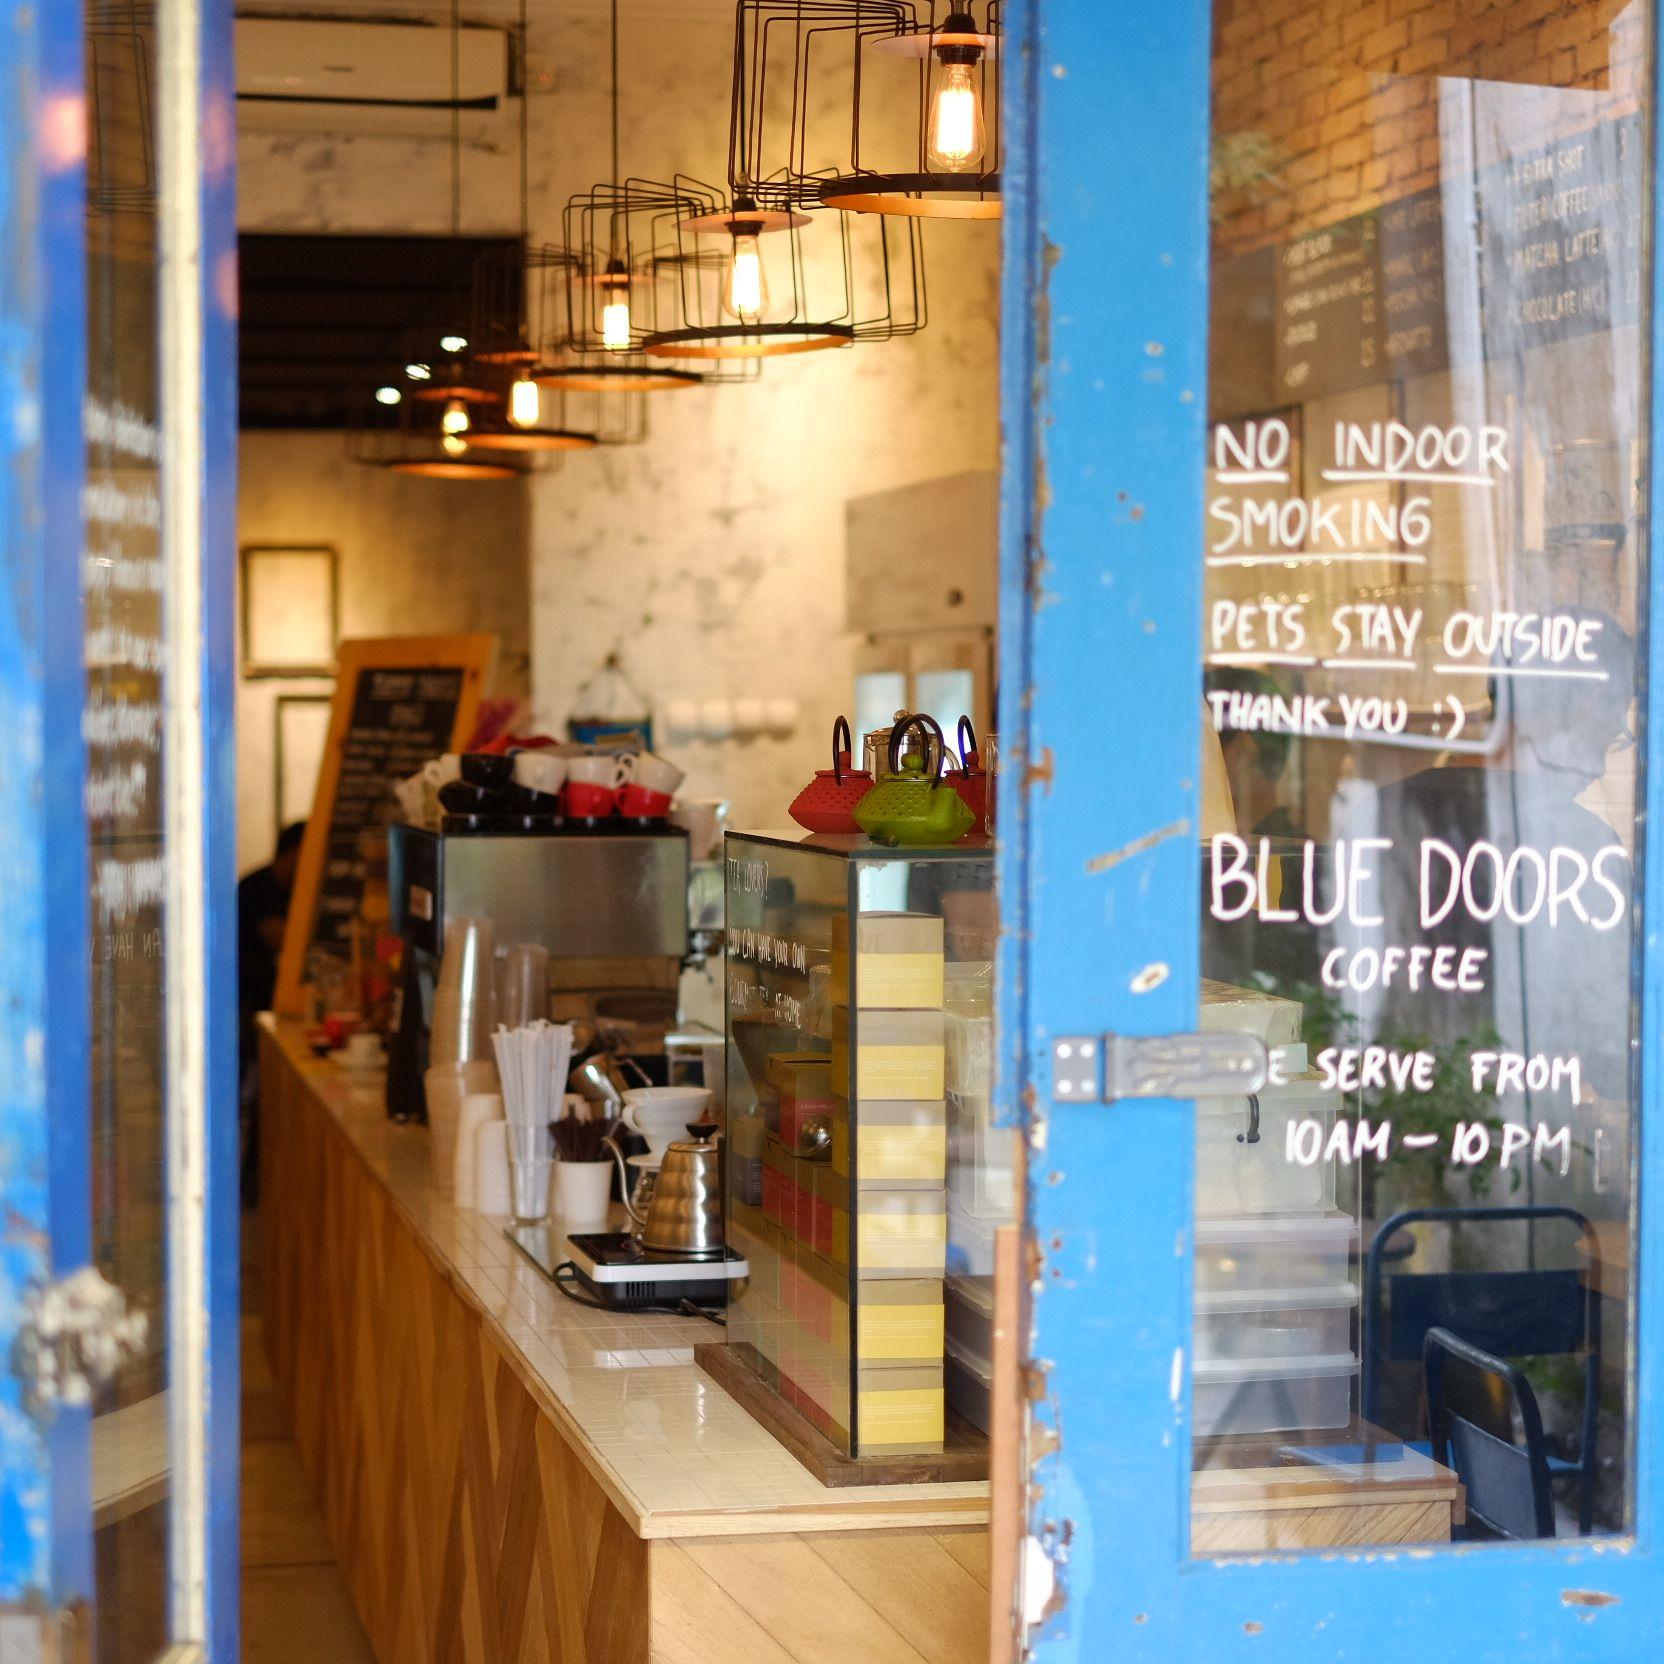 Retail Furniture Bandung: Blue Doors Coffee Shop JL Gandapura No 61 , Bandung